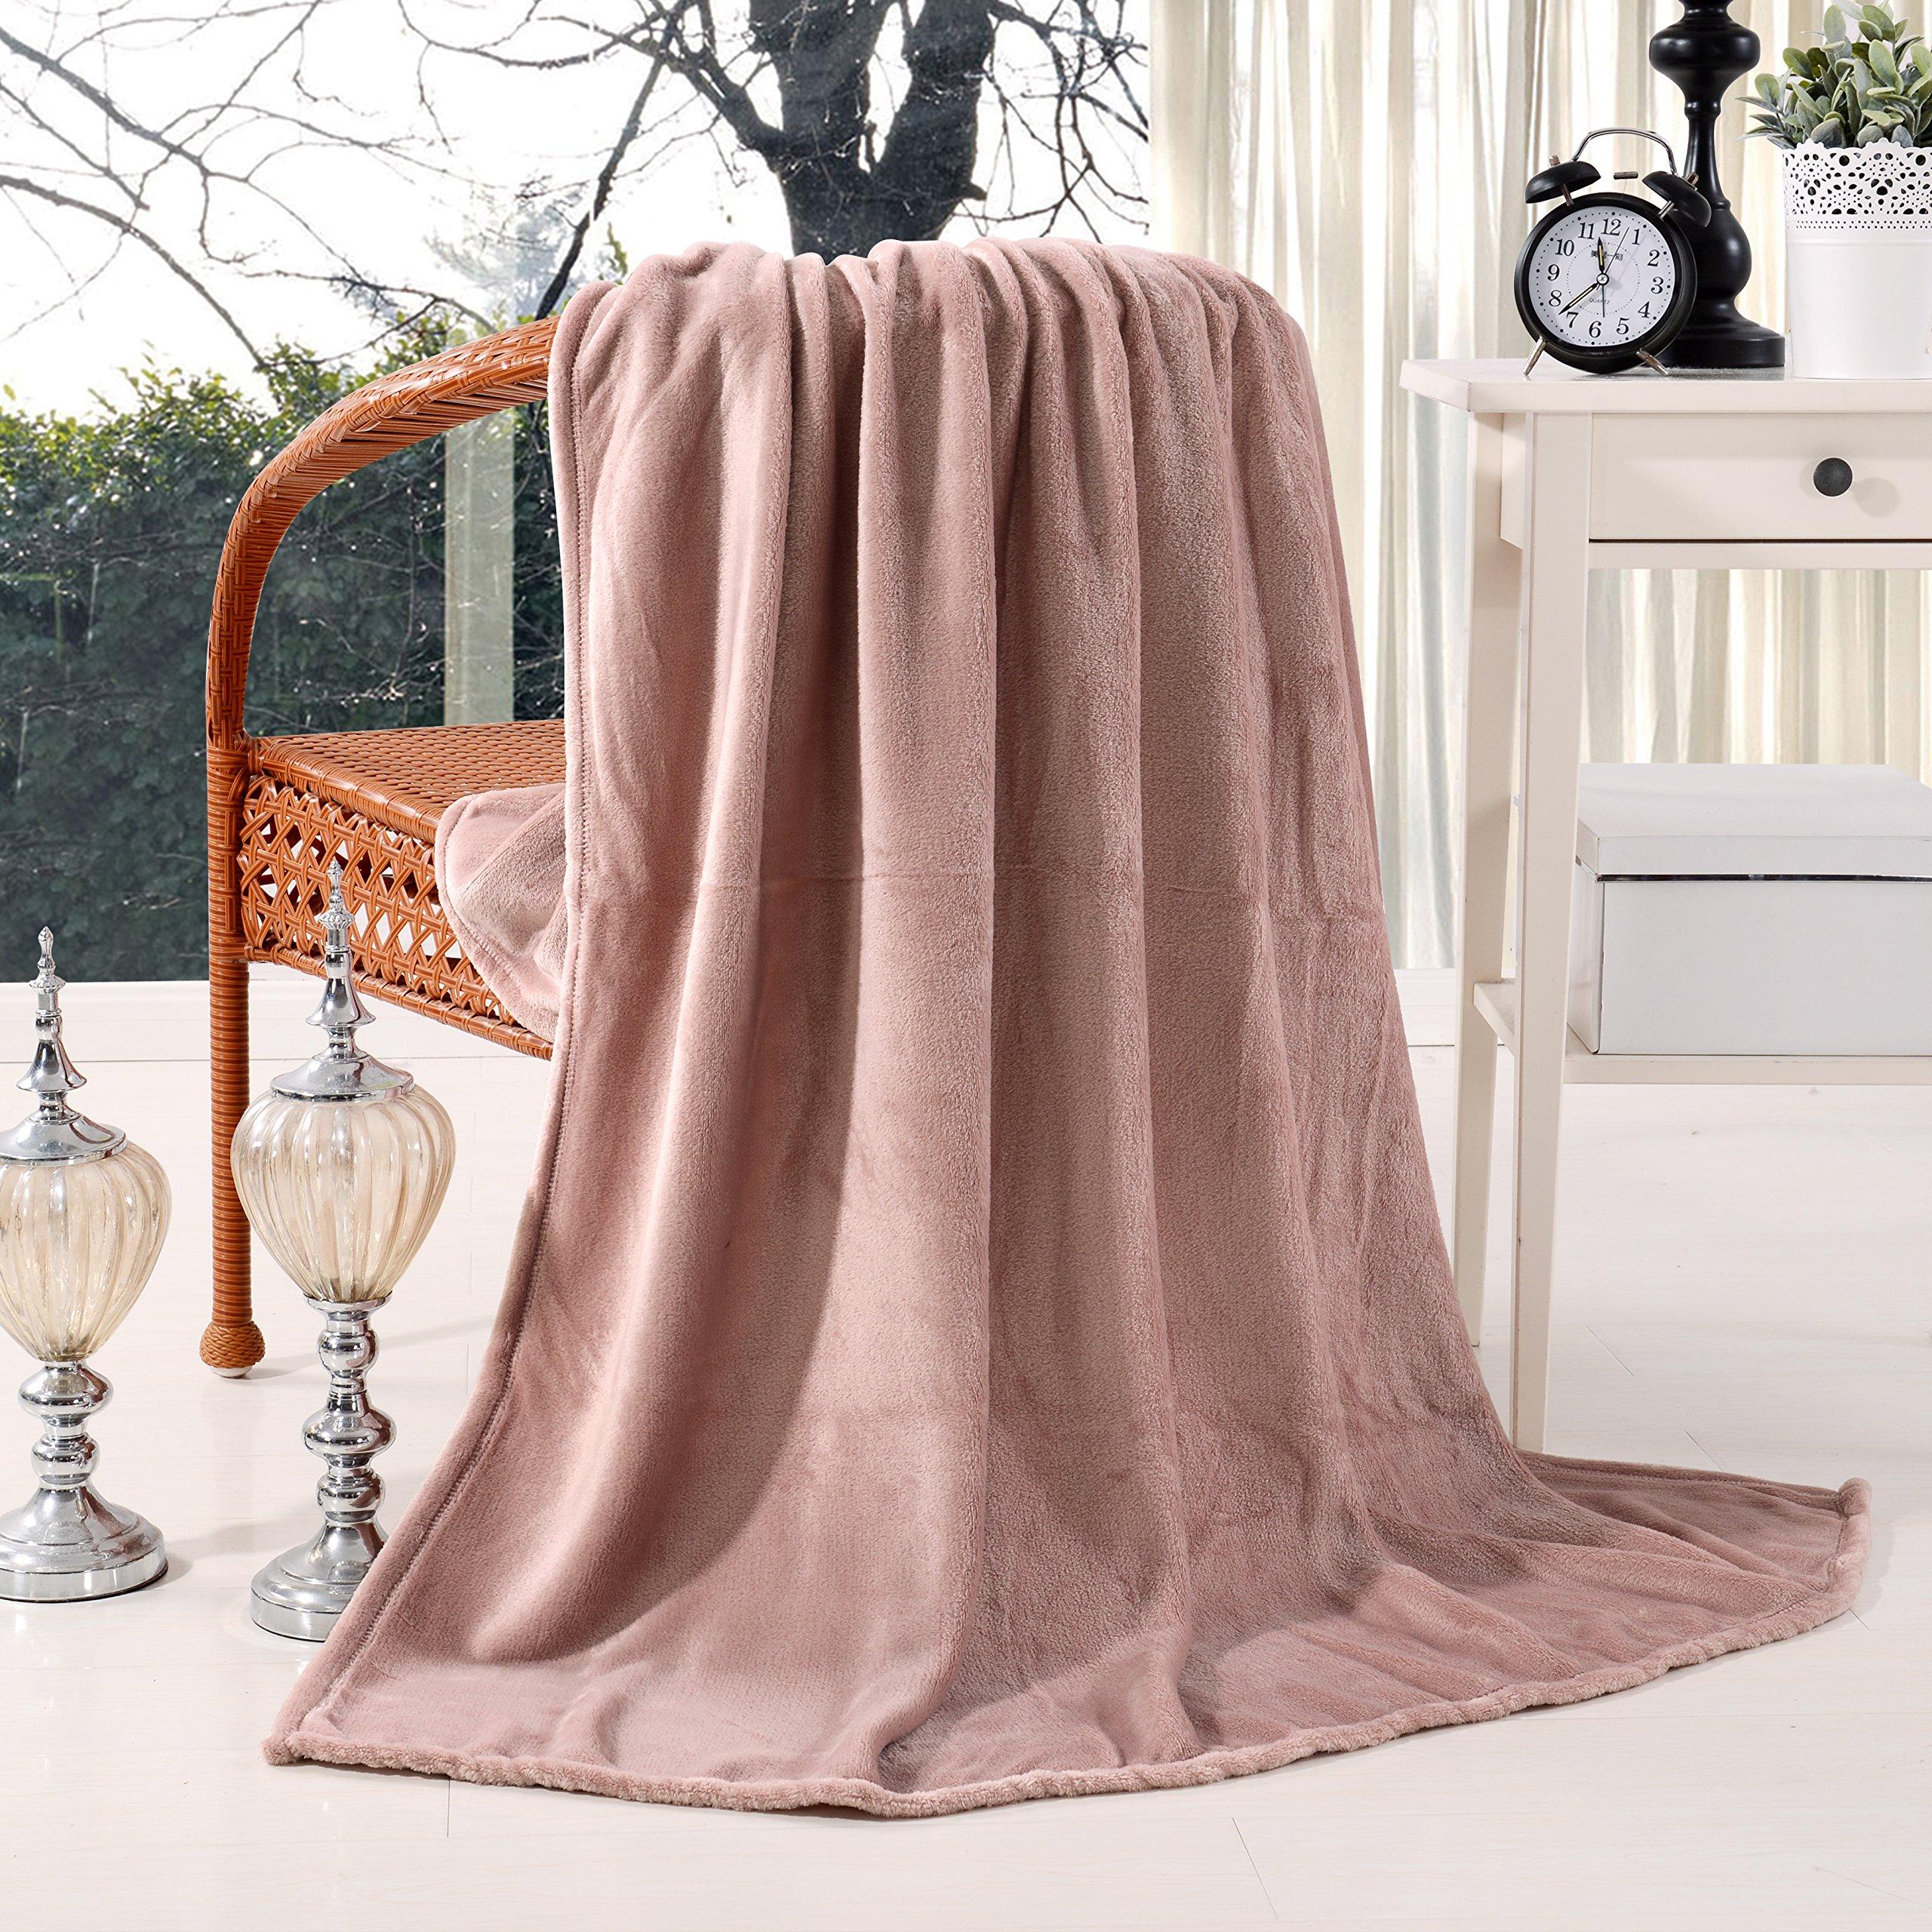 Exclusivo Mezcla Luxury Flannel Velvet Plush Throw Blanket – 50'' x 60'' (Pink)